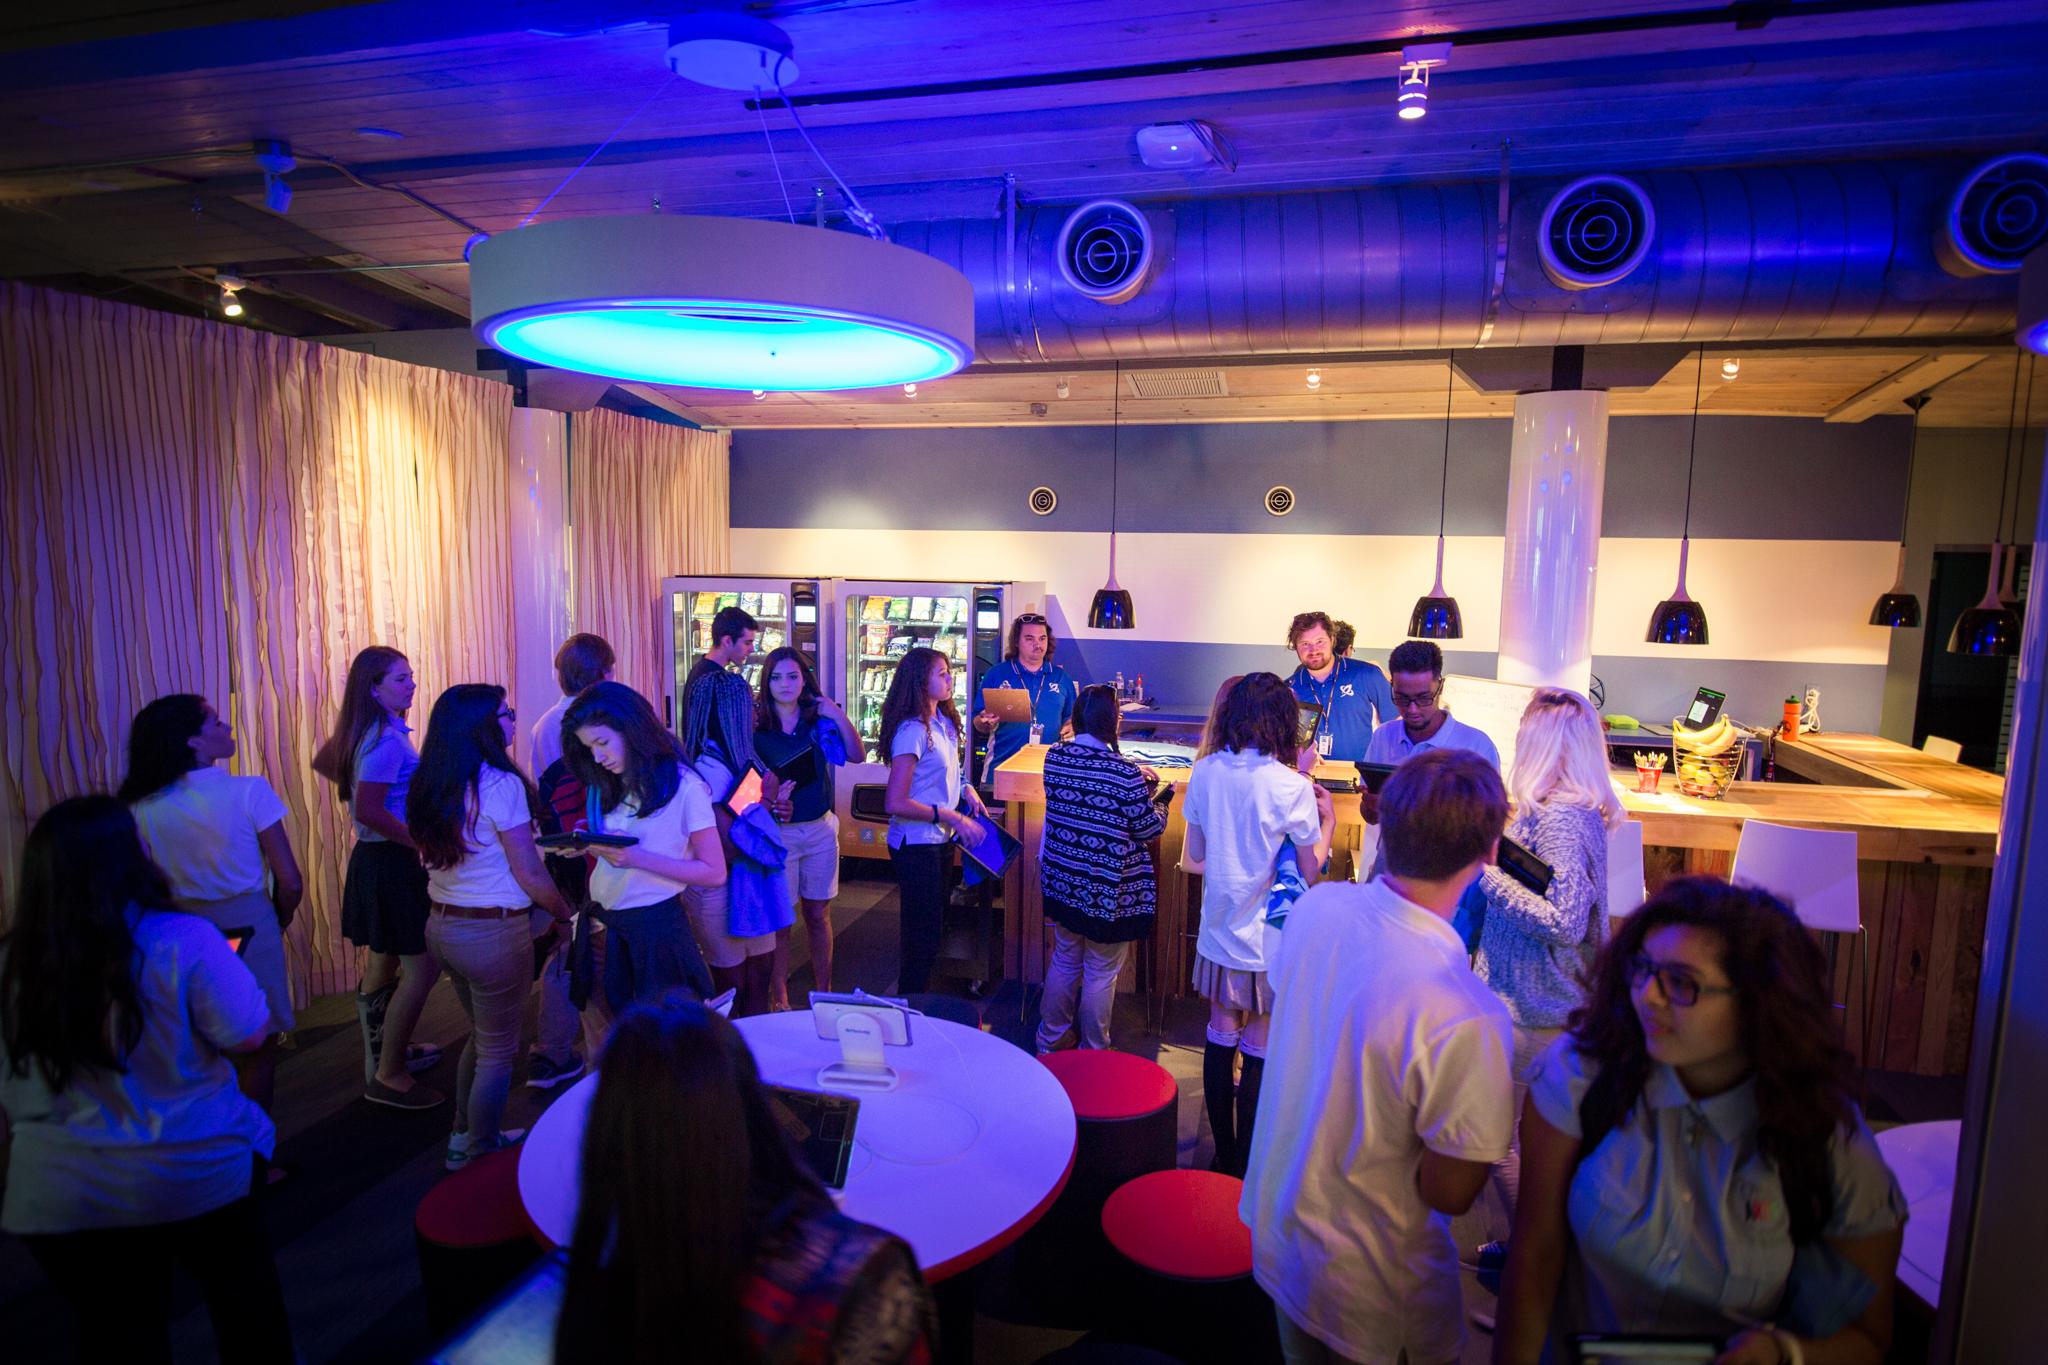 FS_LABS_One_School_of_the_Arts_Aug.24_01.jpg